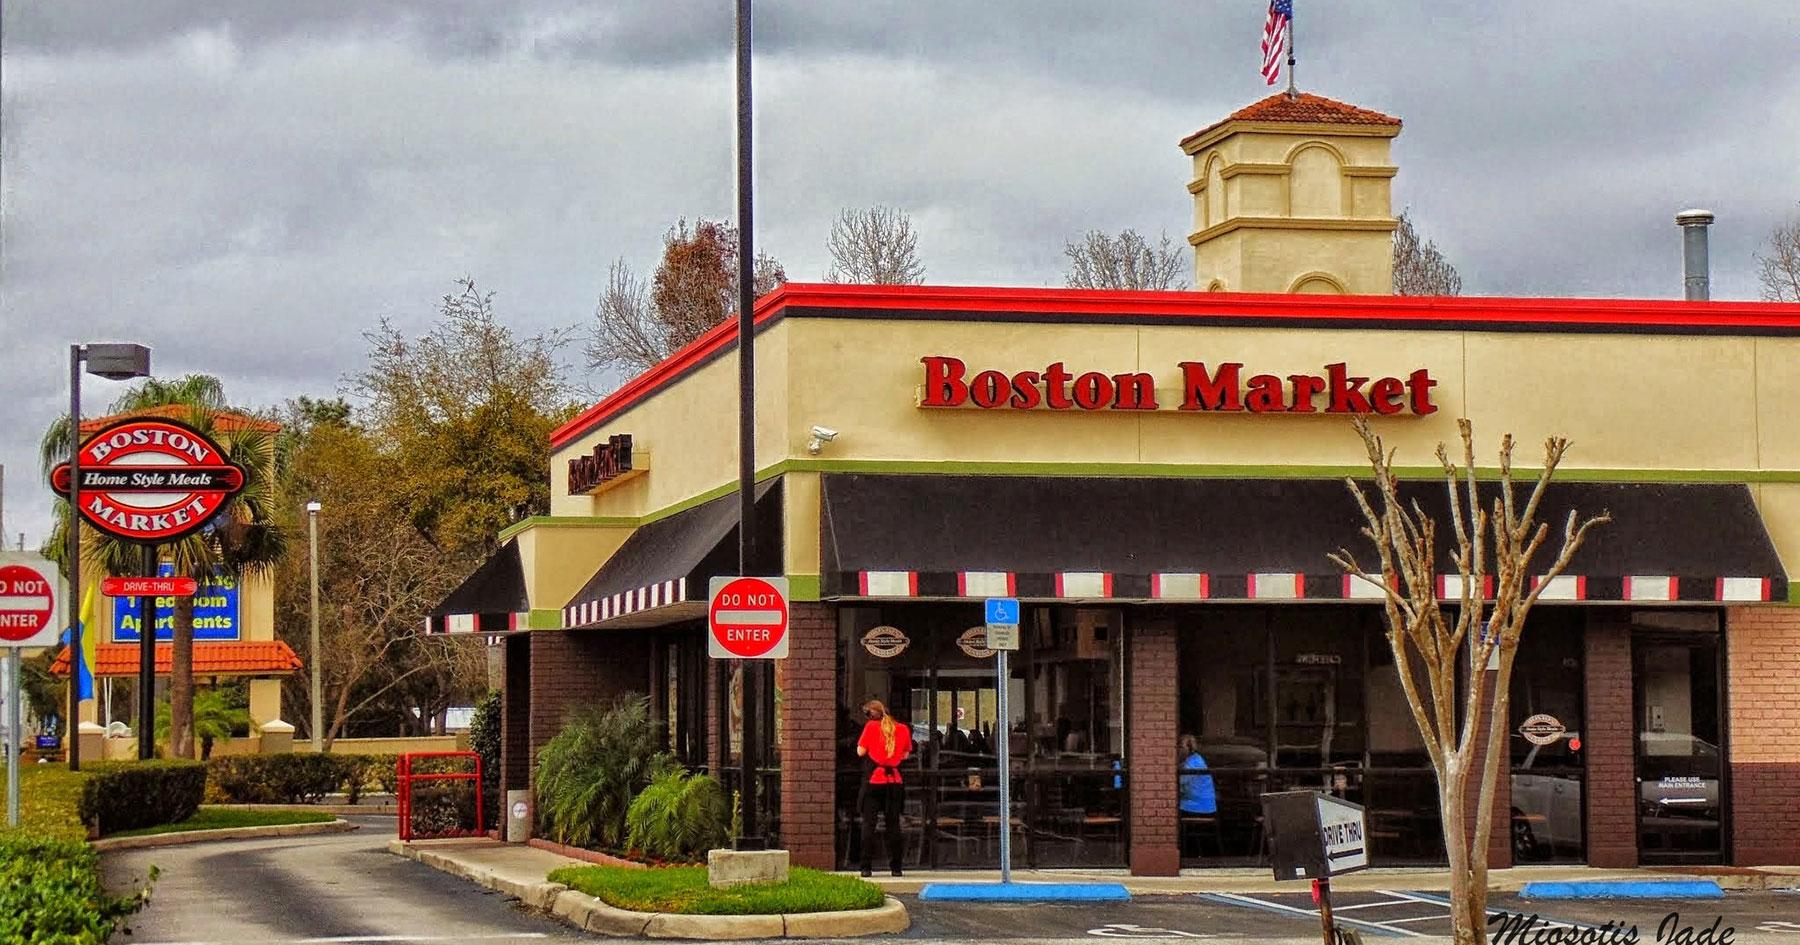 Boston Market closes 45 locations